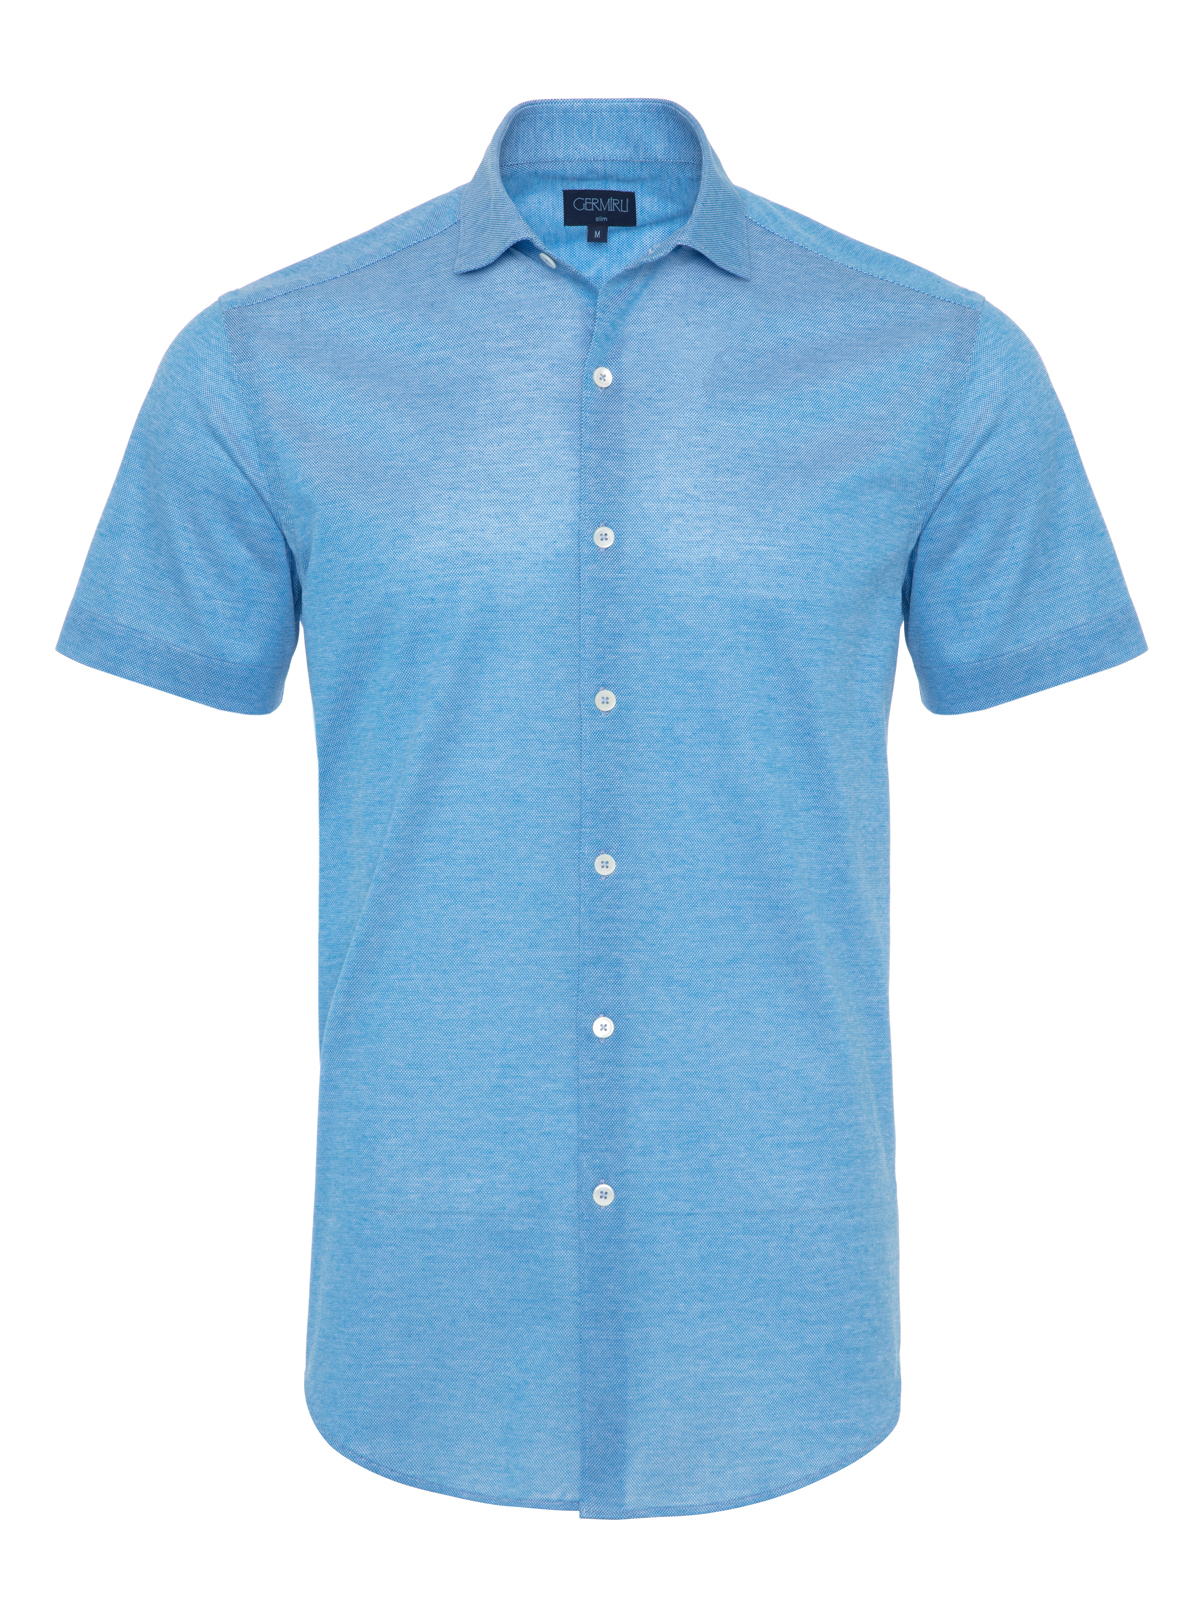 Germirli - Germirli Azur Mavisi Klasik Yaka Piquet Örme Kısa Kollu Slim Fit Gömlek